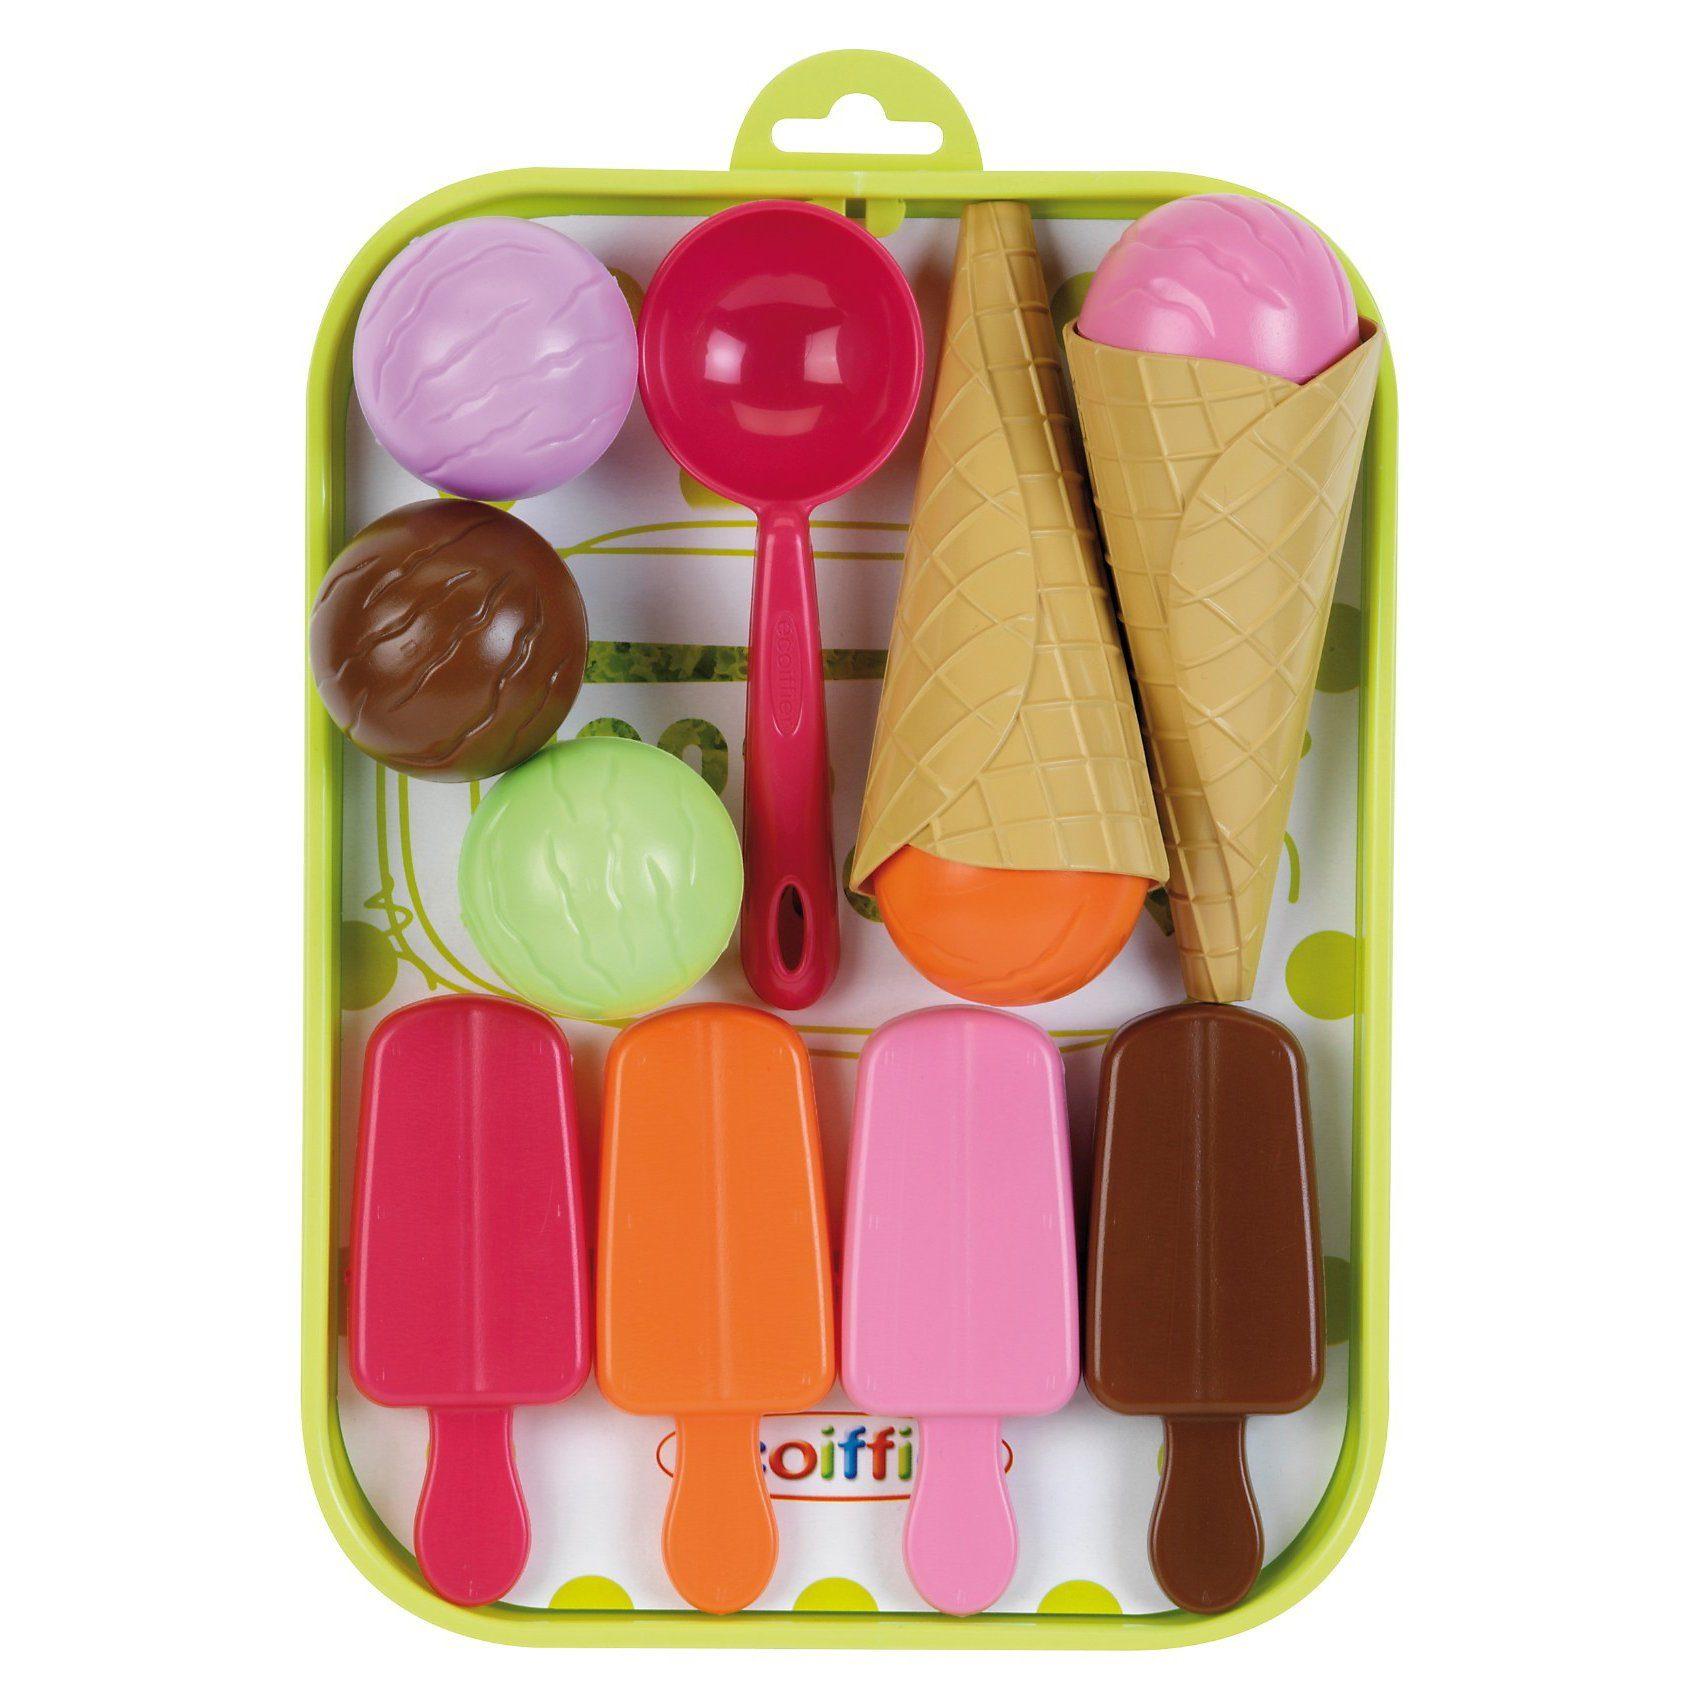 Spiellebensmittel Eis-Tablett